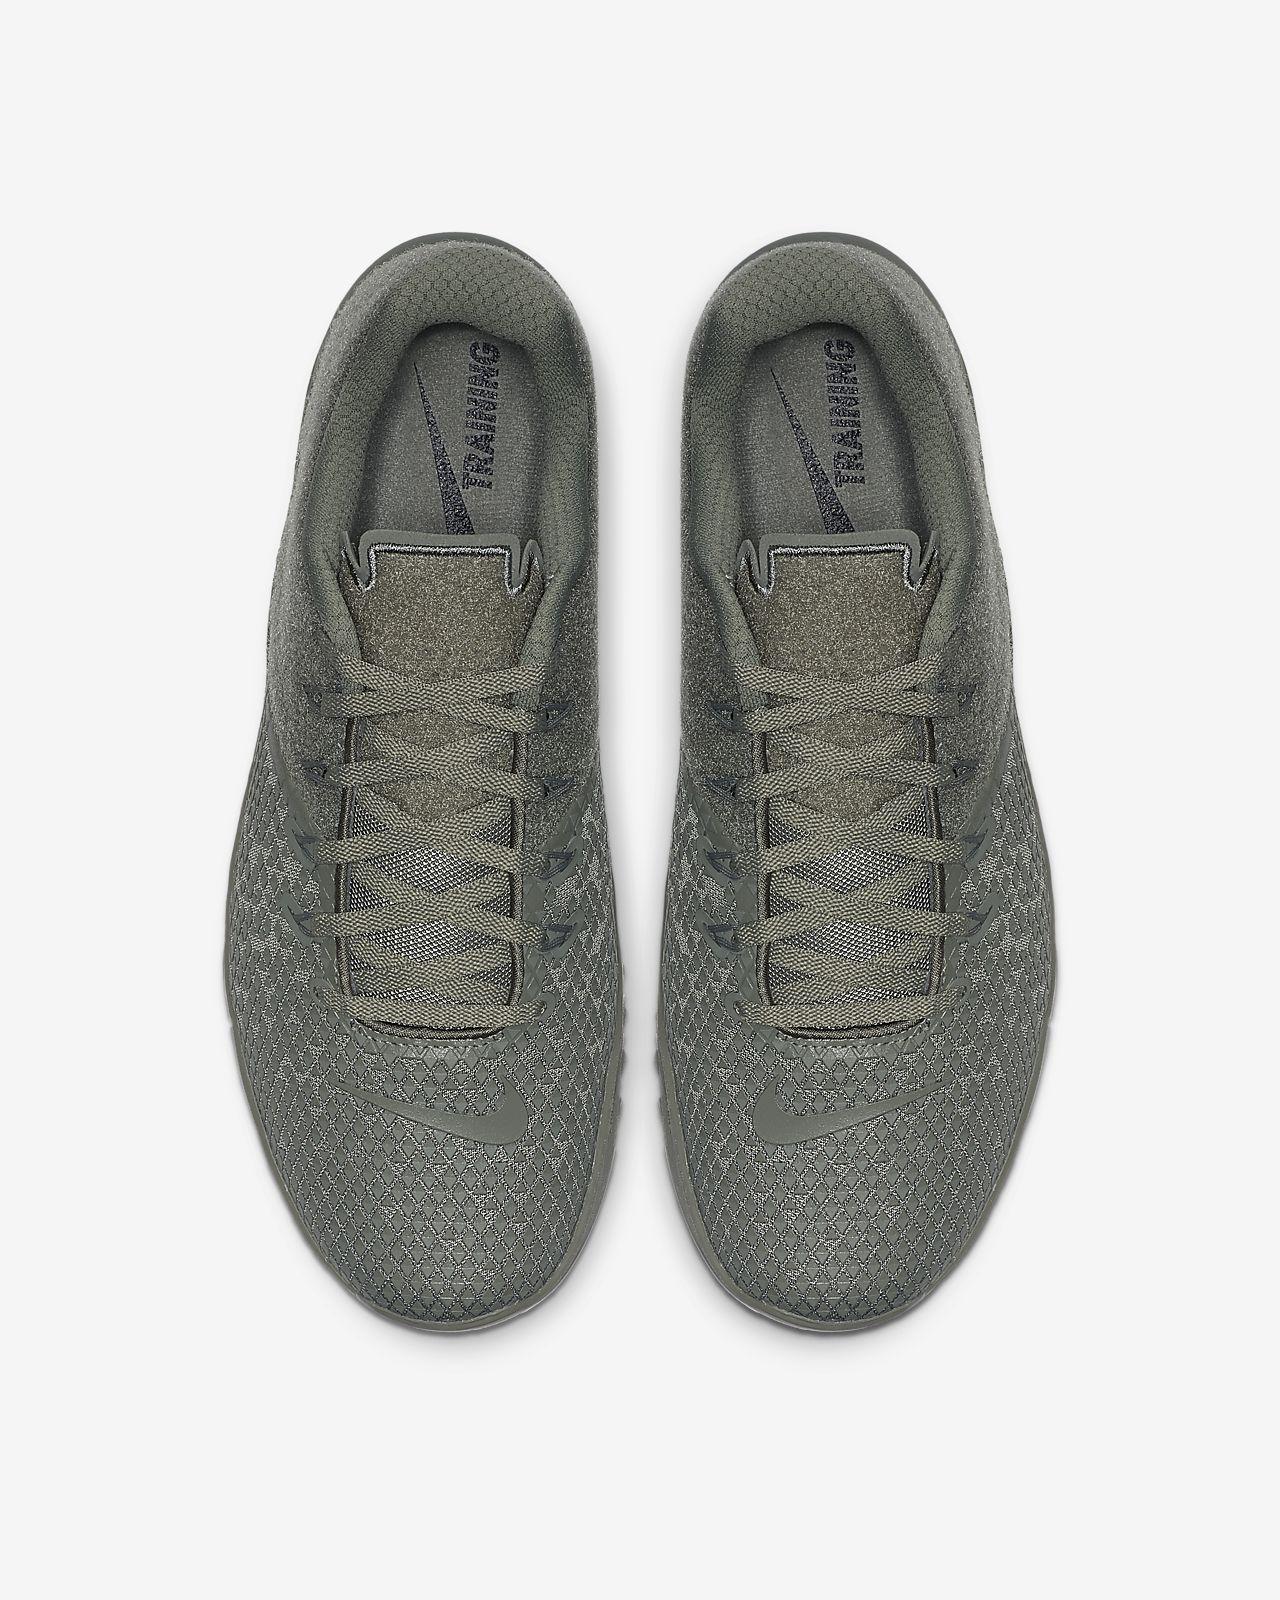 wholesale dealer 9e767 ba043 ... Nike Metcon 4 XD Patch Men s Training Shoe